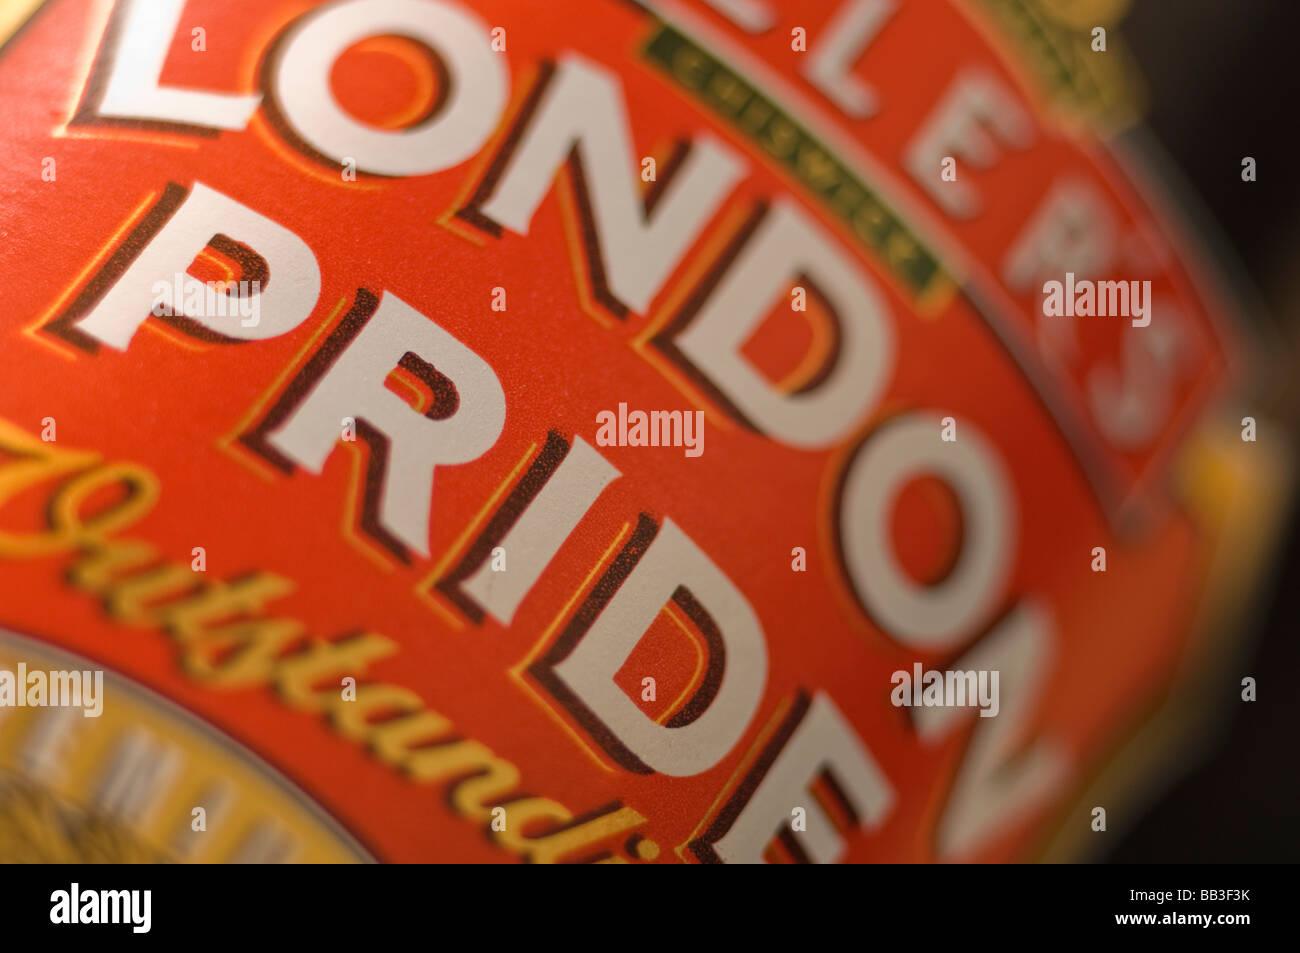 Fullers of Chiswick London Pride beer bottle label closeup - Stock Image